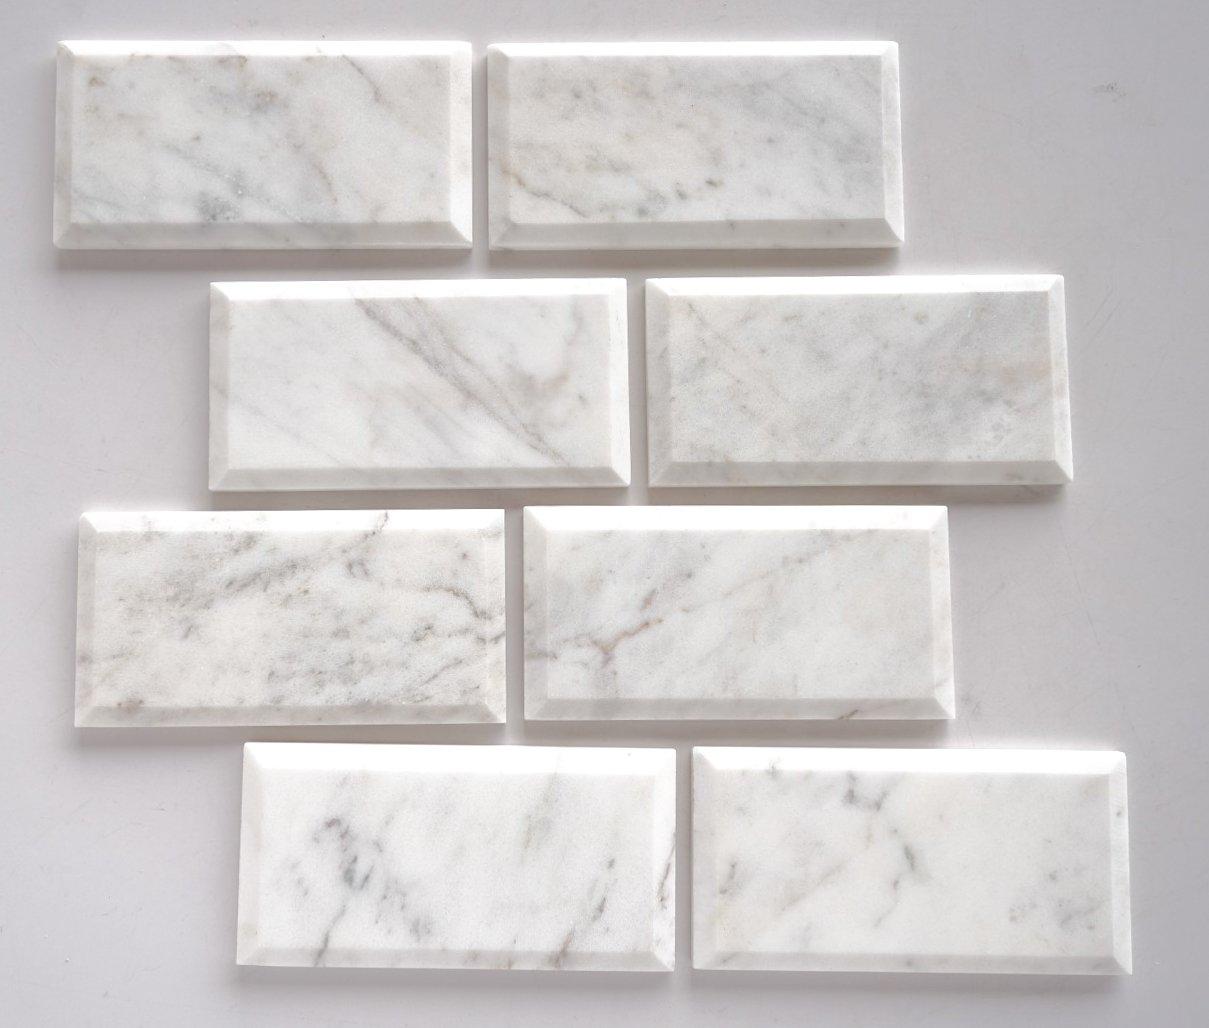 Bianco Venatino Marble 3X6 Deep - Beveled & Honed Subway Tile - STANDARD QUALITY - Lot of 20 Sq. Ft.